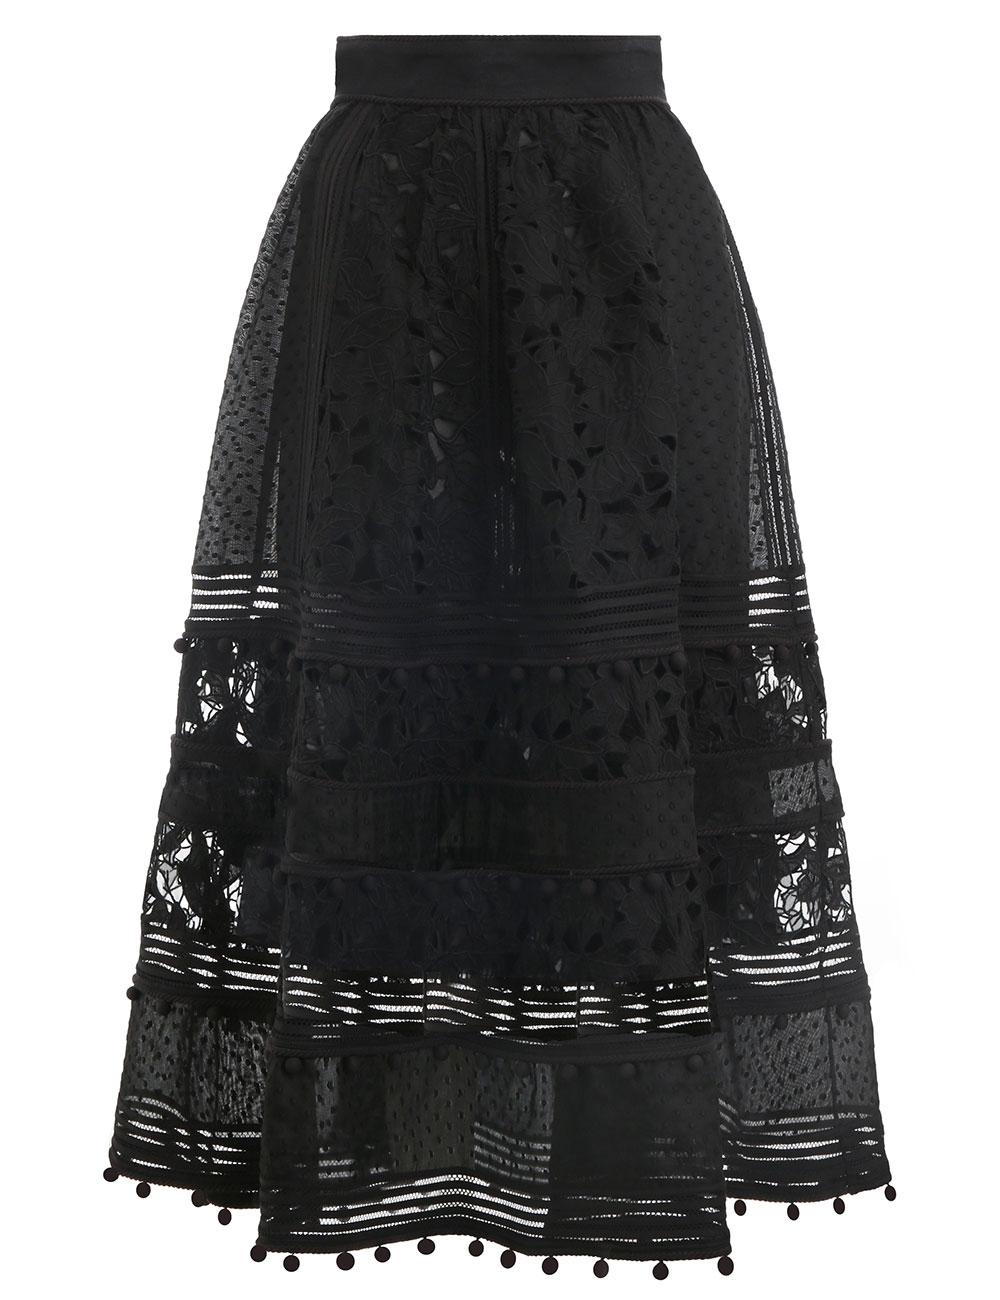 ded671ed87 Shop Designer Skirts Online | ZIMMERMANN